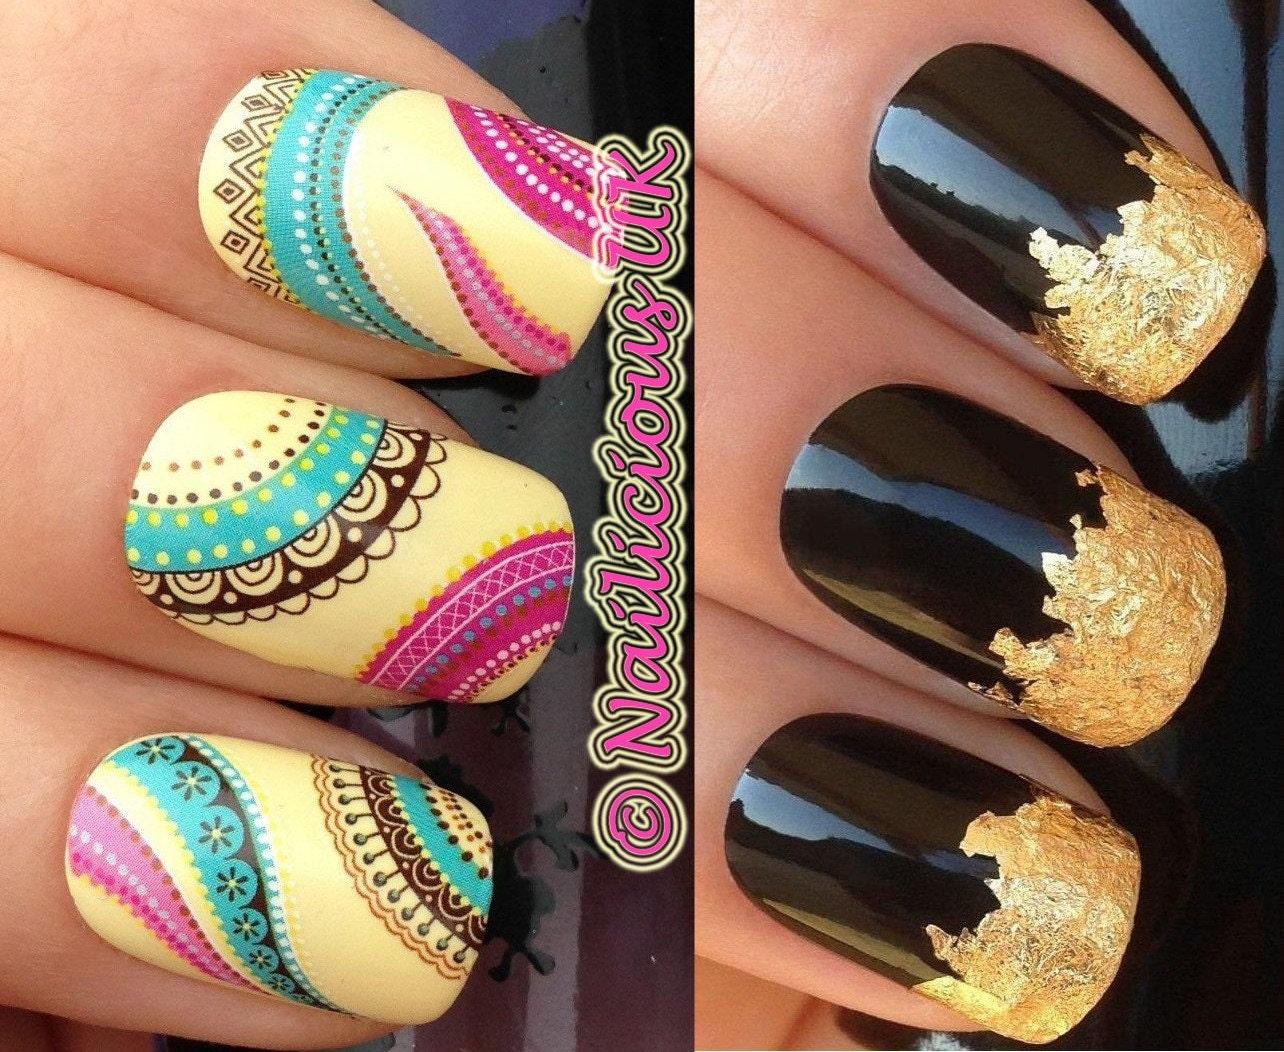 Nail art set 238 ethnic boho hippy chic colourful pattern zoom prinsesfo Images